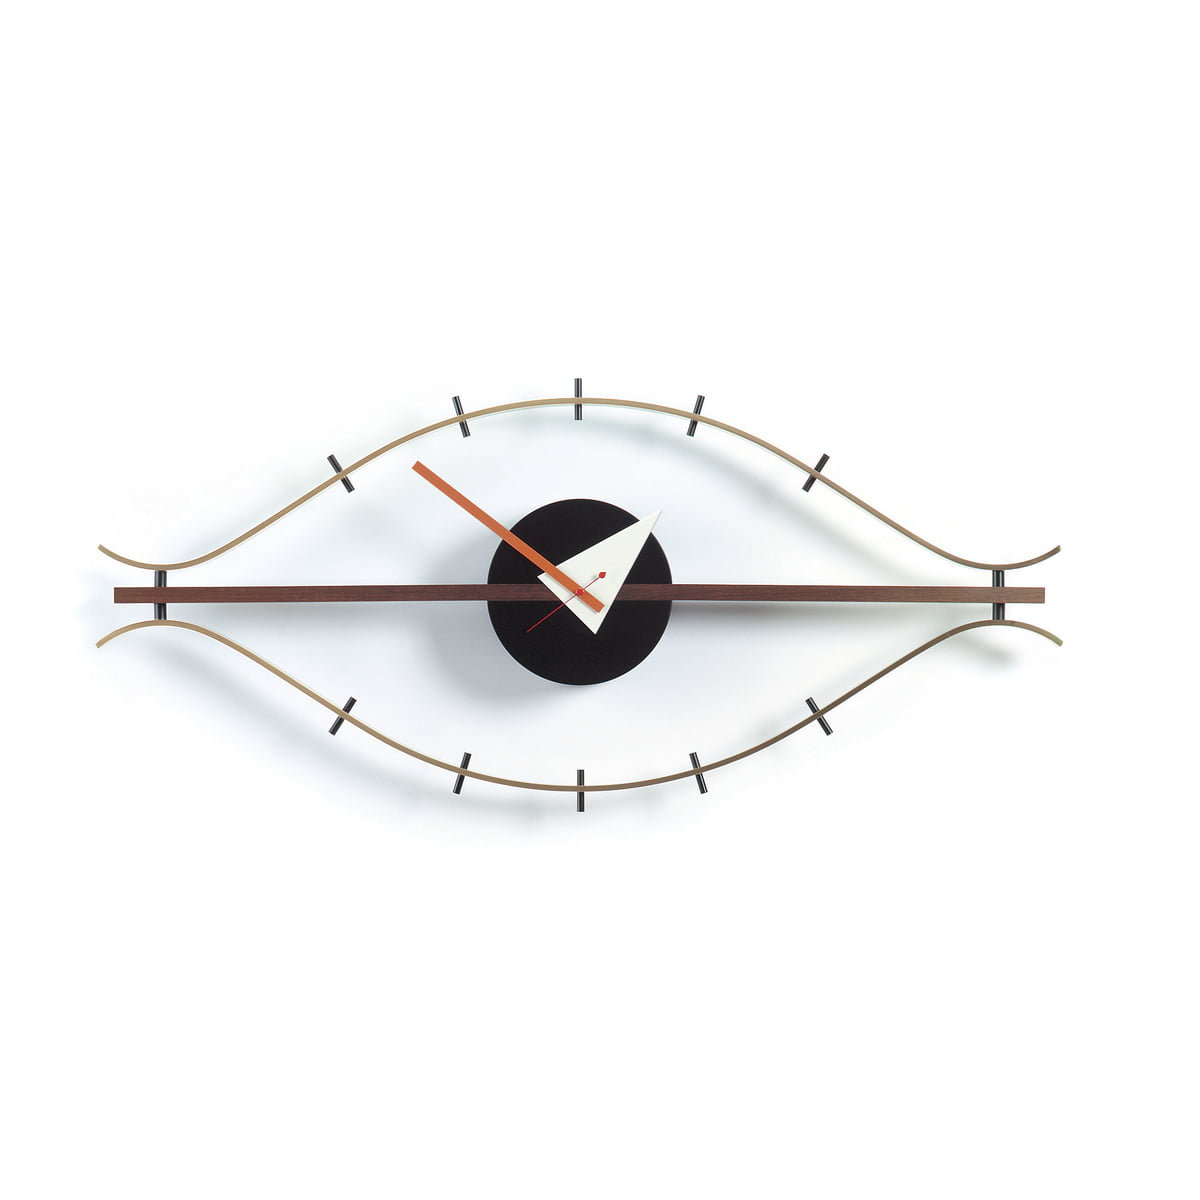 Vitra eye clock frei